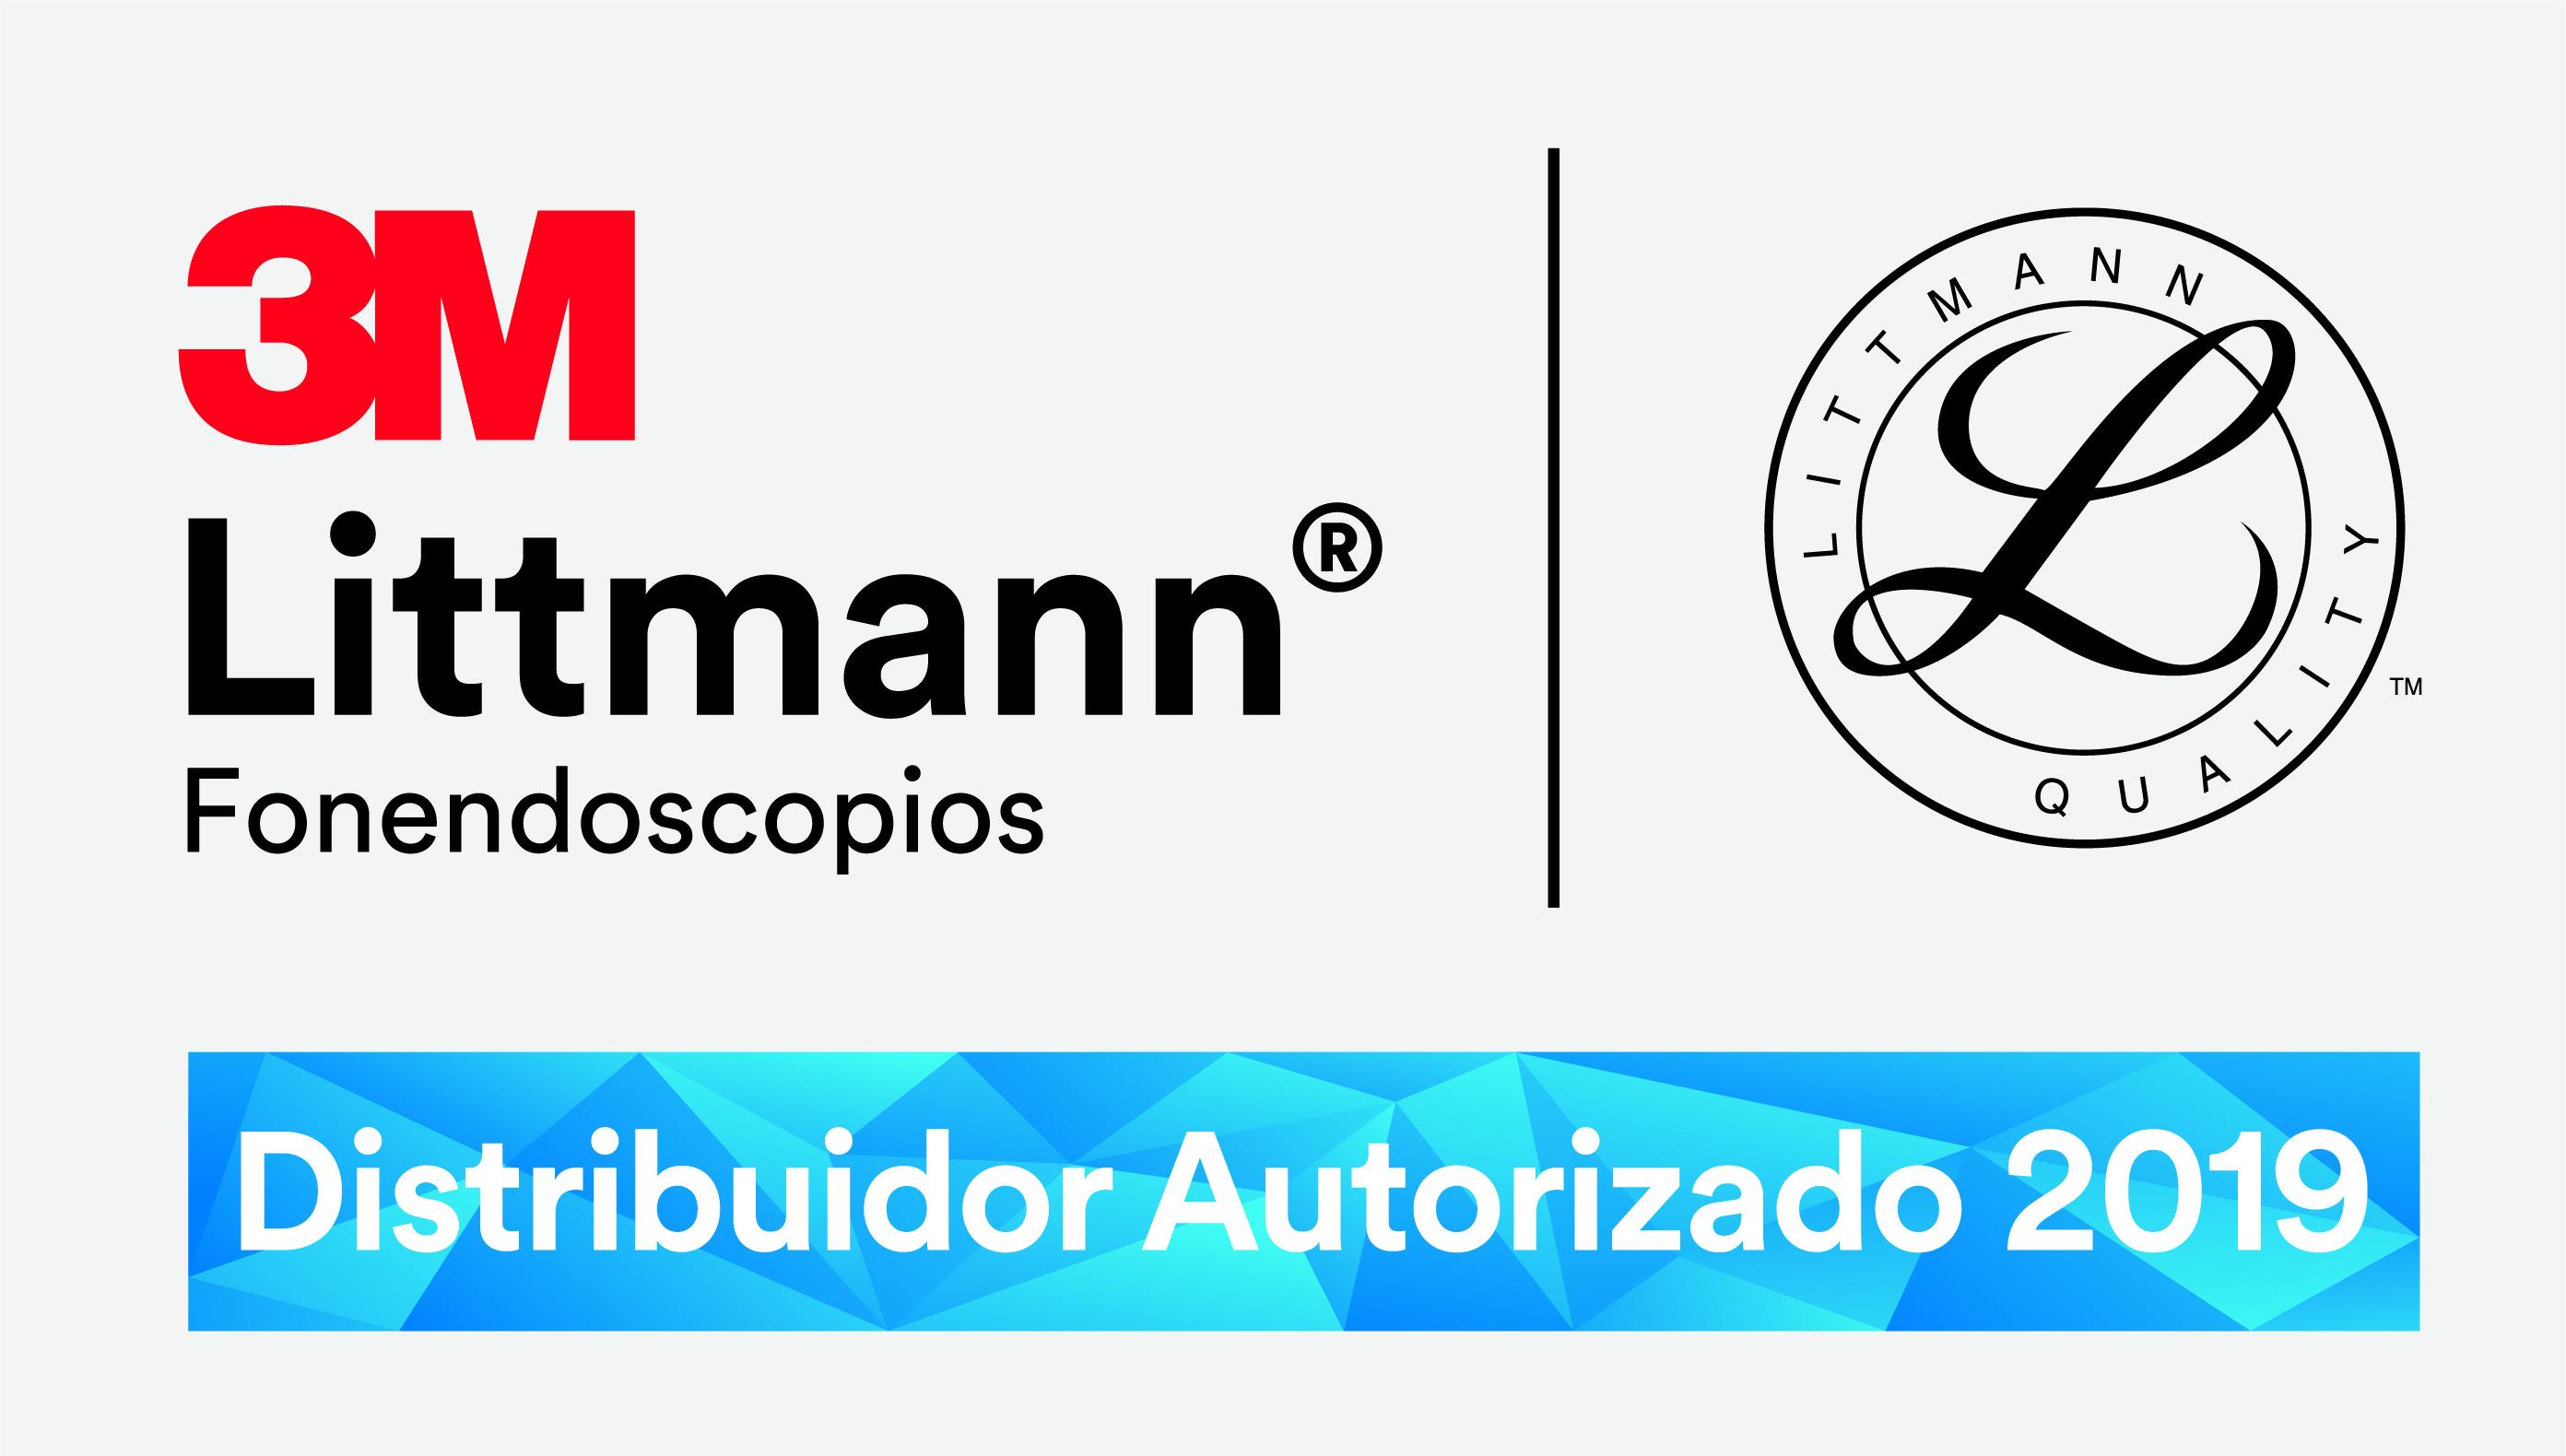 Littmann Fonendoscopios